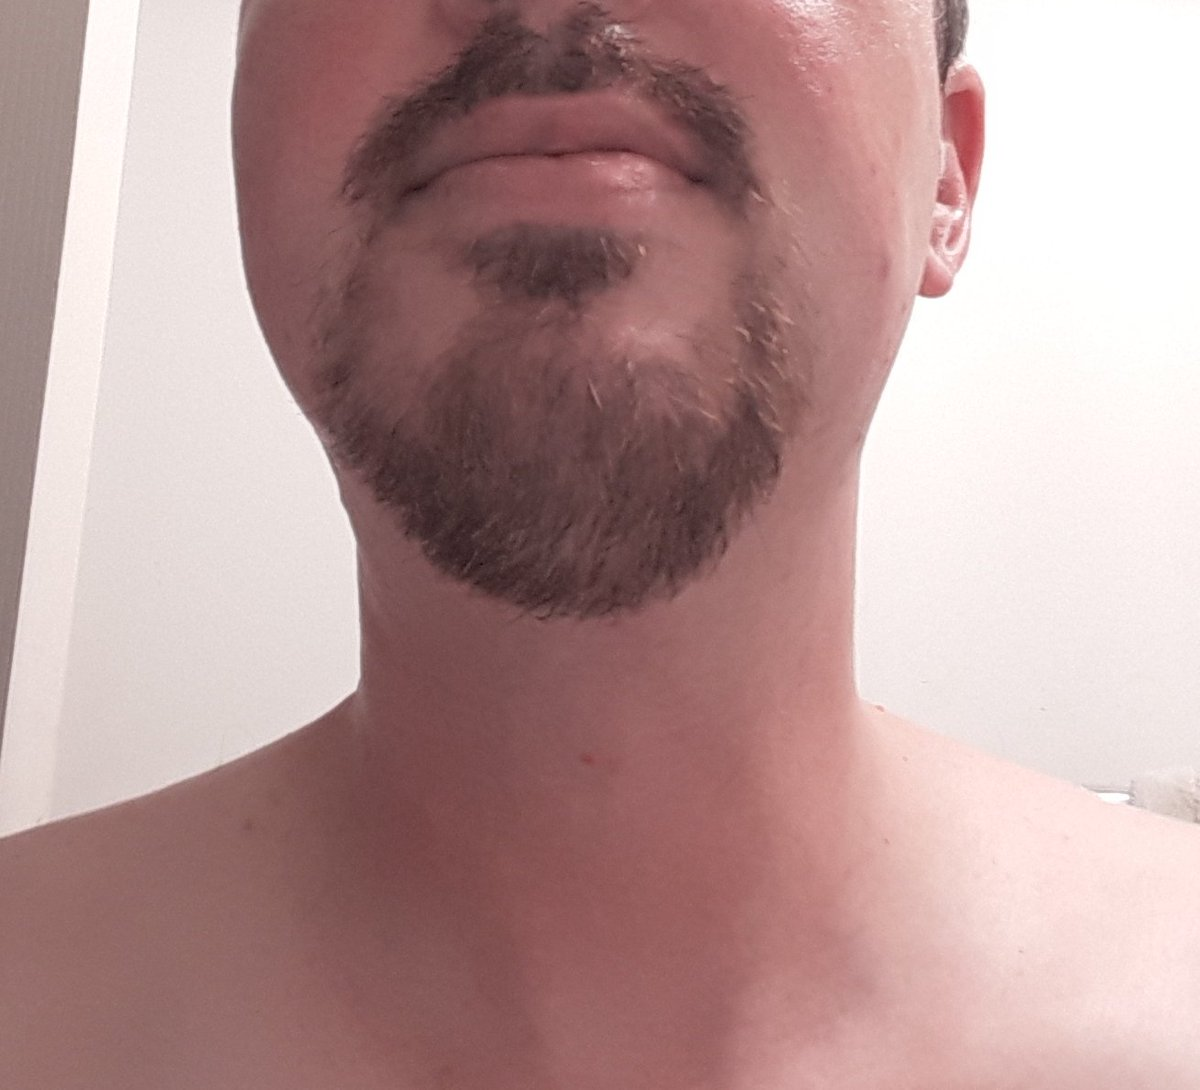 Goodbye Rubbish Beard, hello Respectable Beard. #BackToWork https://t.co/ZA7IsQmbik